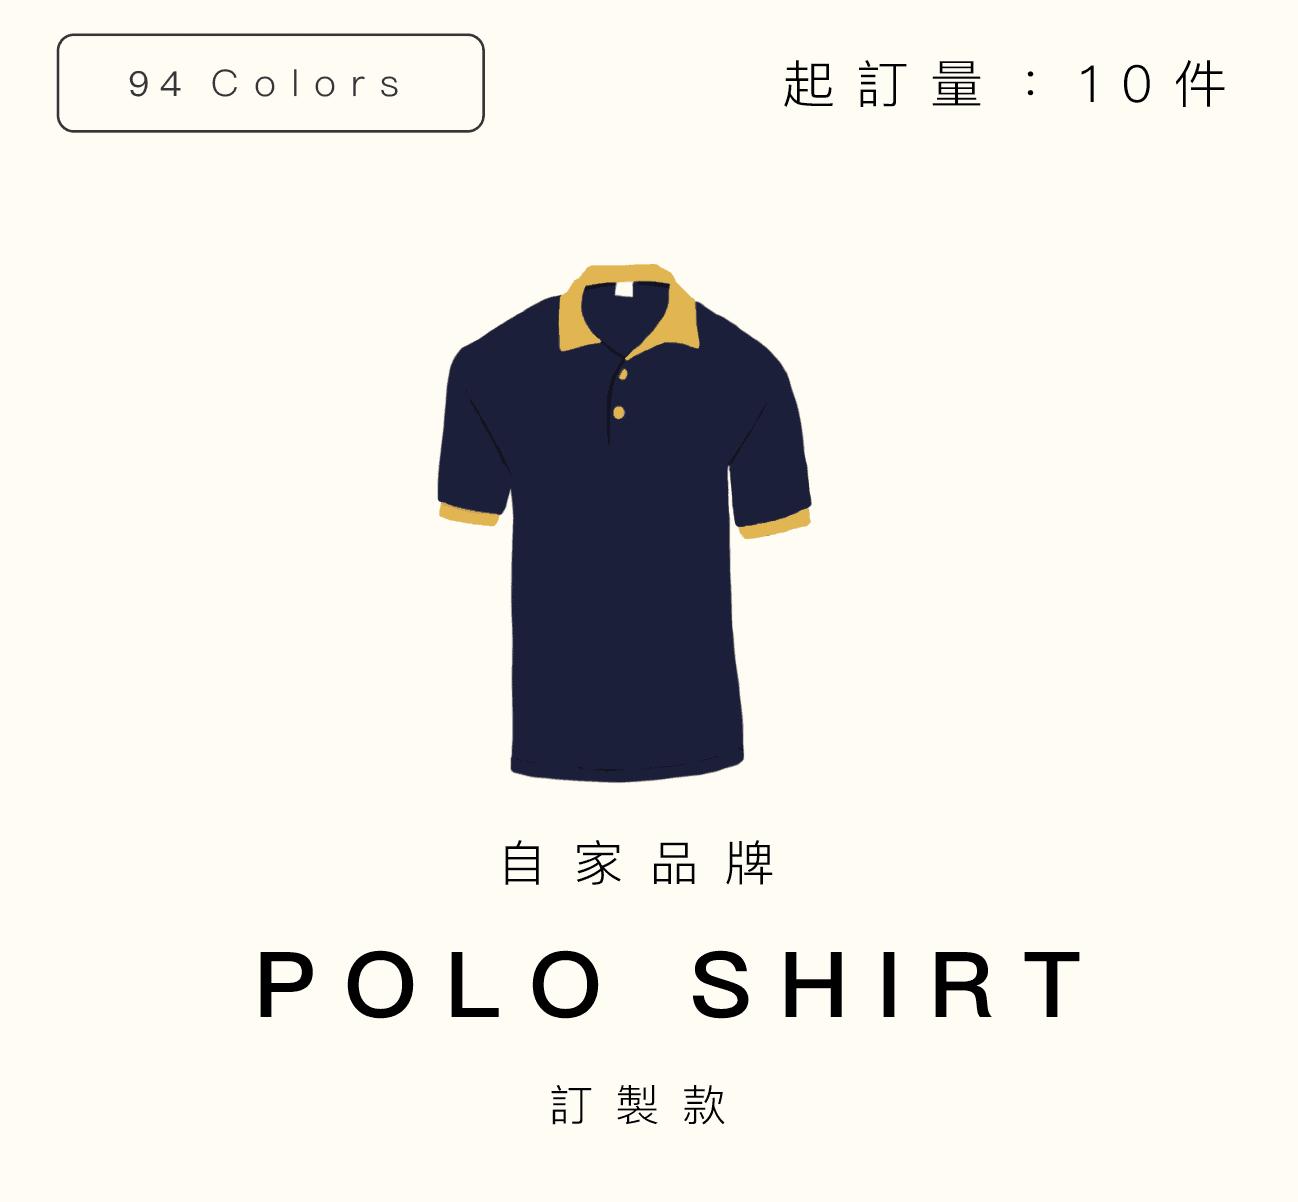 自家品牌短袖Polo Shirt